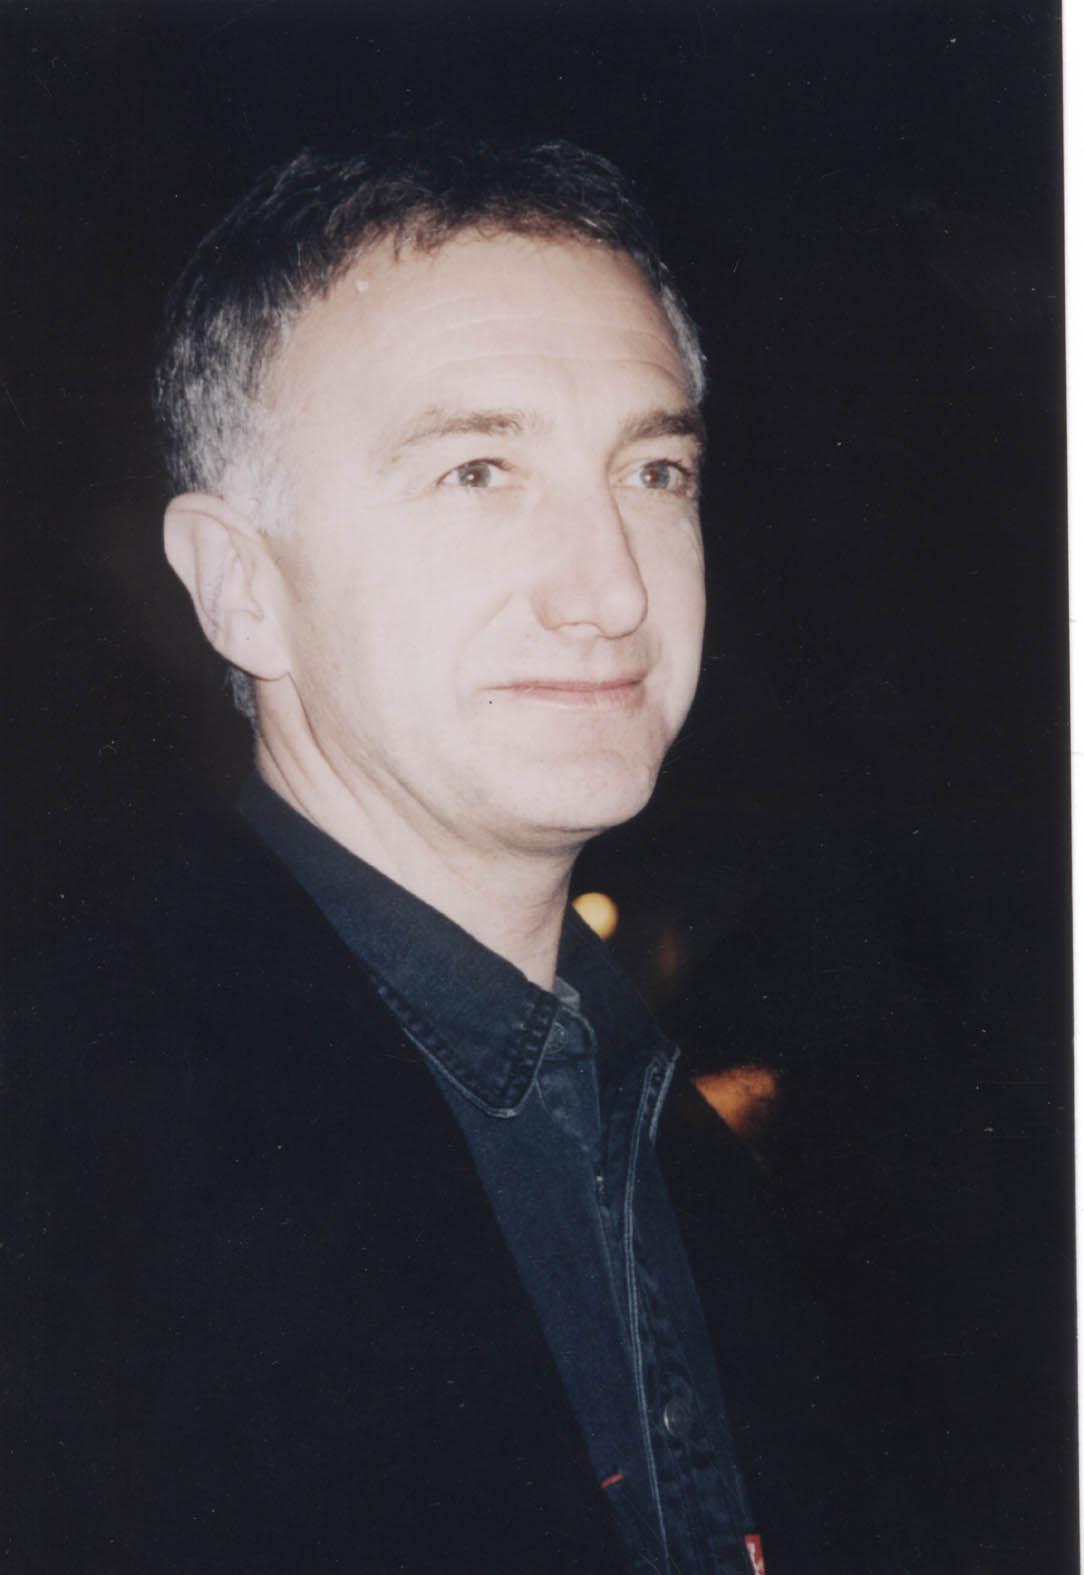 deacon-1997.jpg